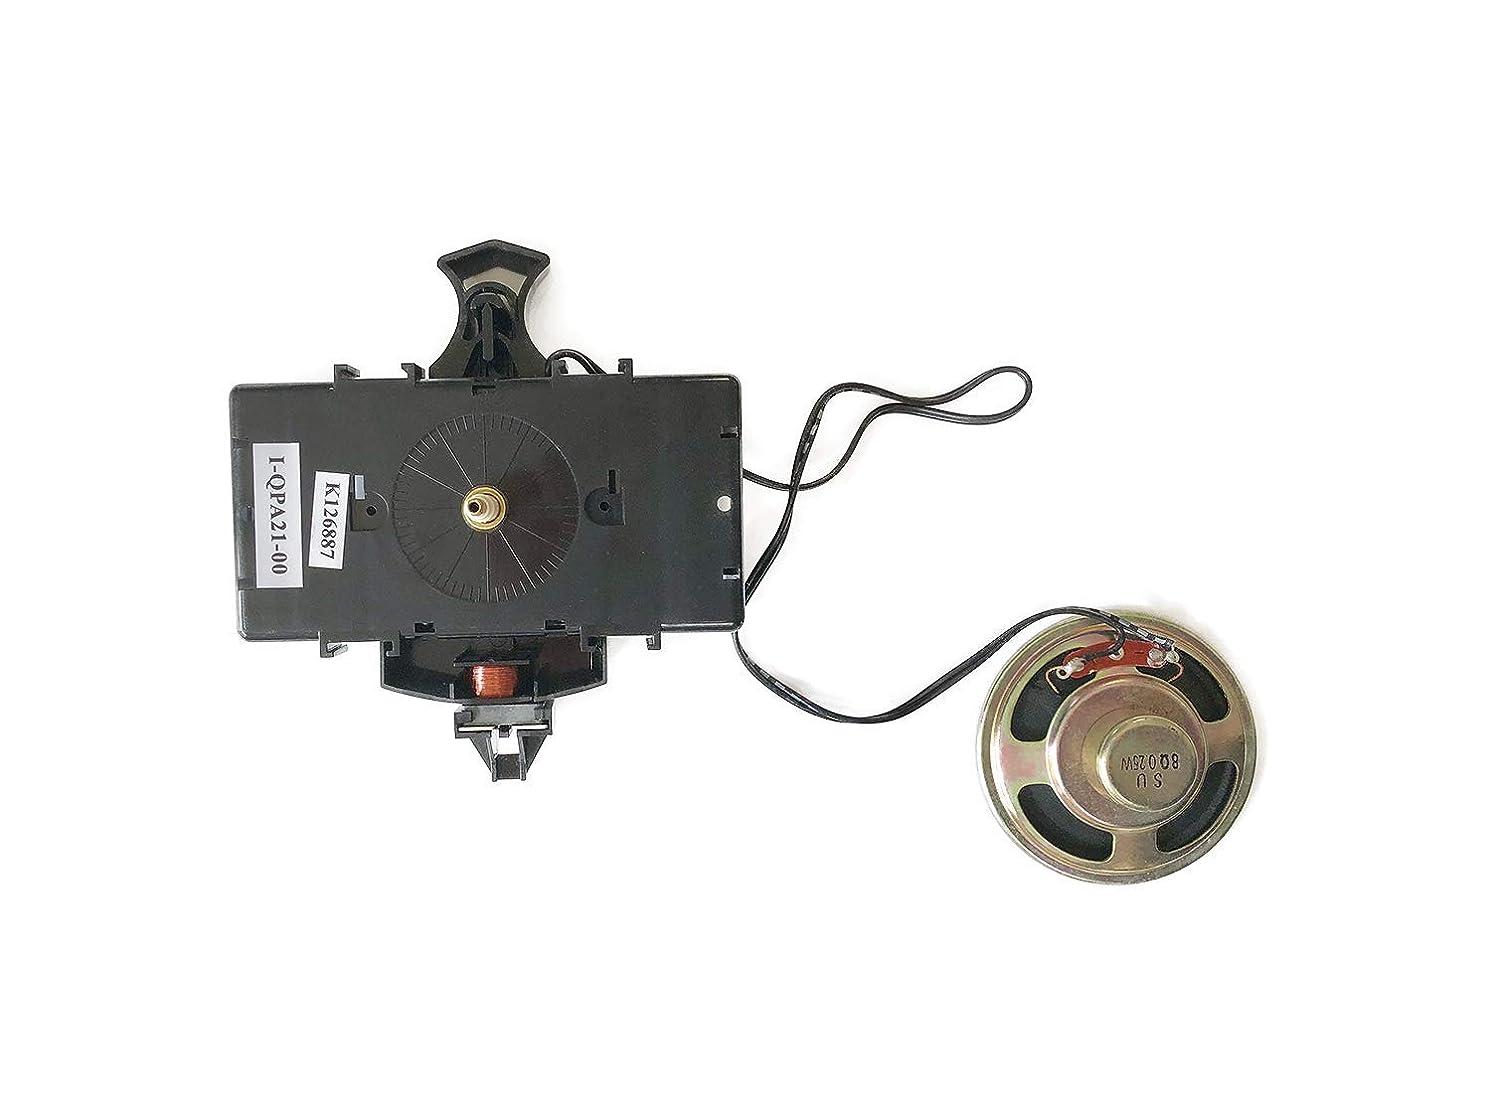 Replacement Battery Quartz Movement for Hermle 2214, 2215 or Any Clock, DIY Clock Kit with Howard Miller 354472 / Kieninger QPA11 Pendulum Unit, 16mm Shaft Length